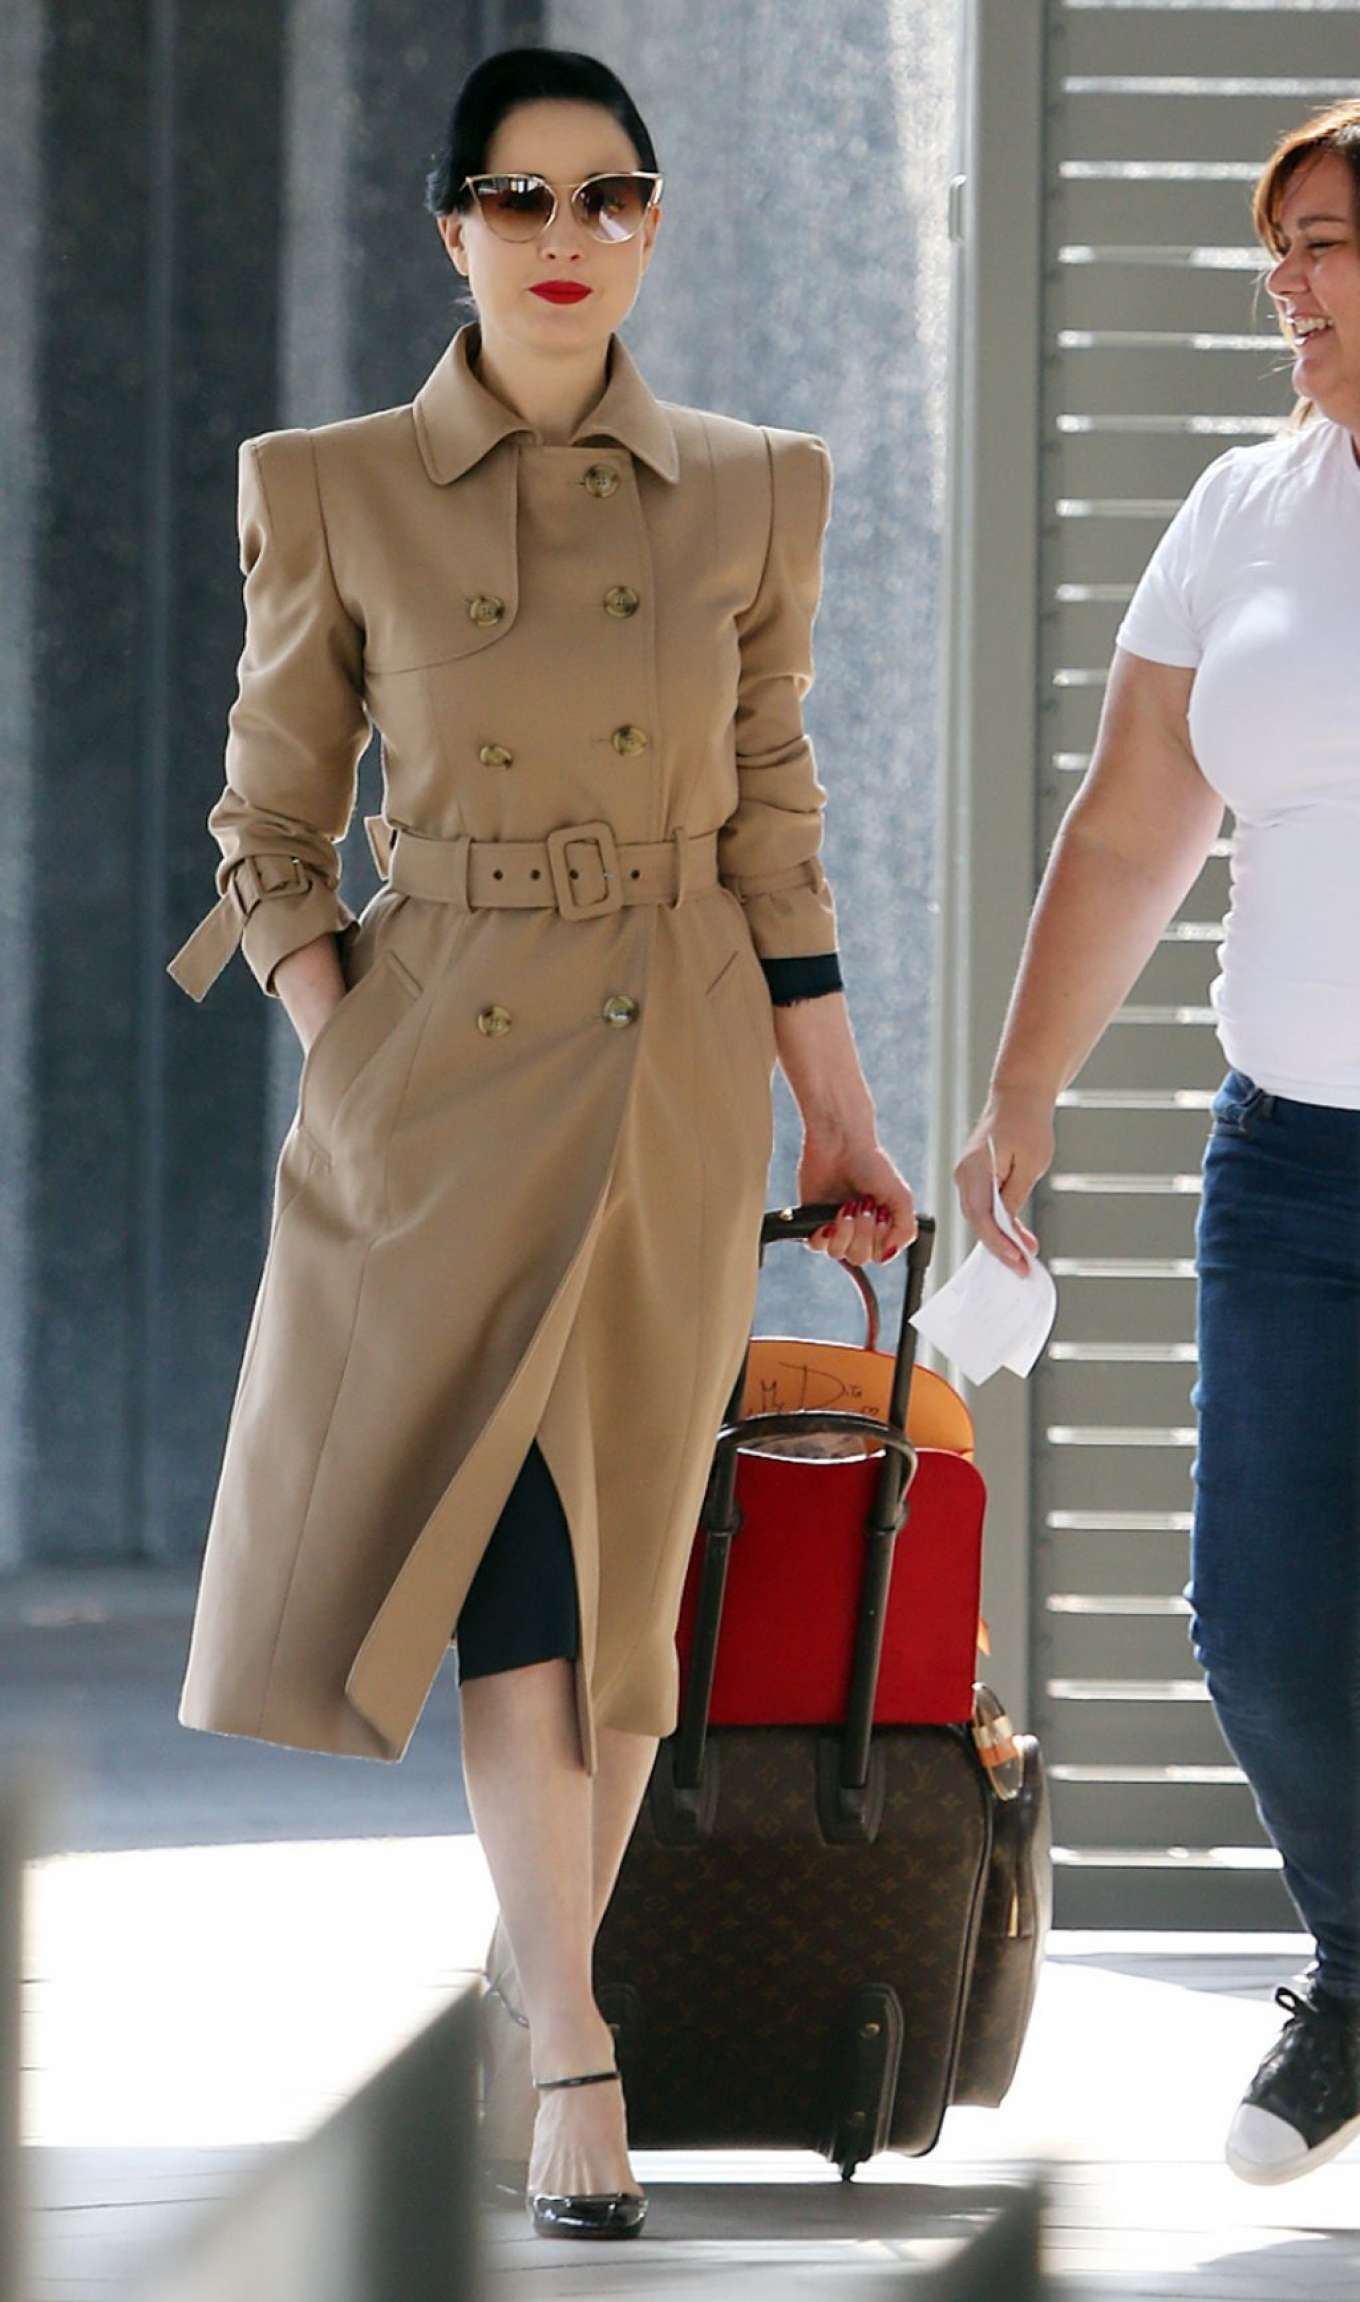 fe76c6c1e0f3 Dita Von Teese  Arrives at Perth Airport -02 – GotCeleb